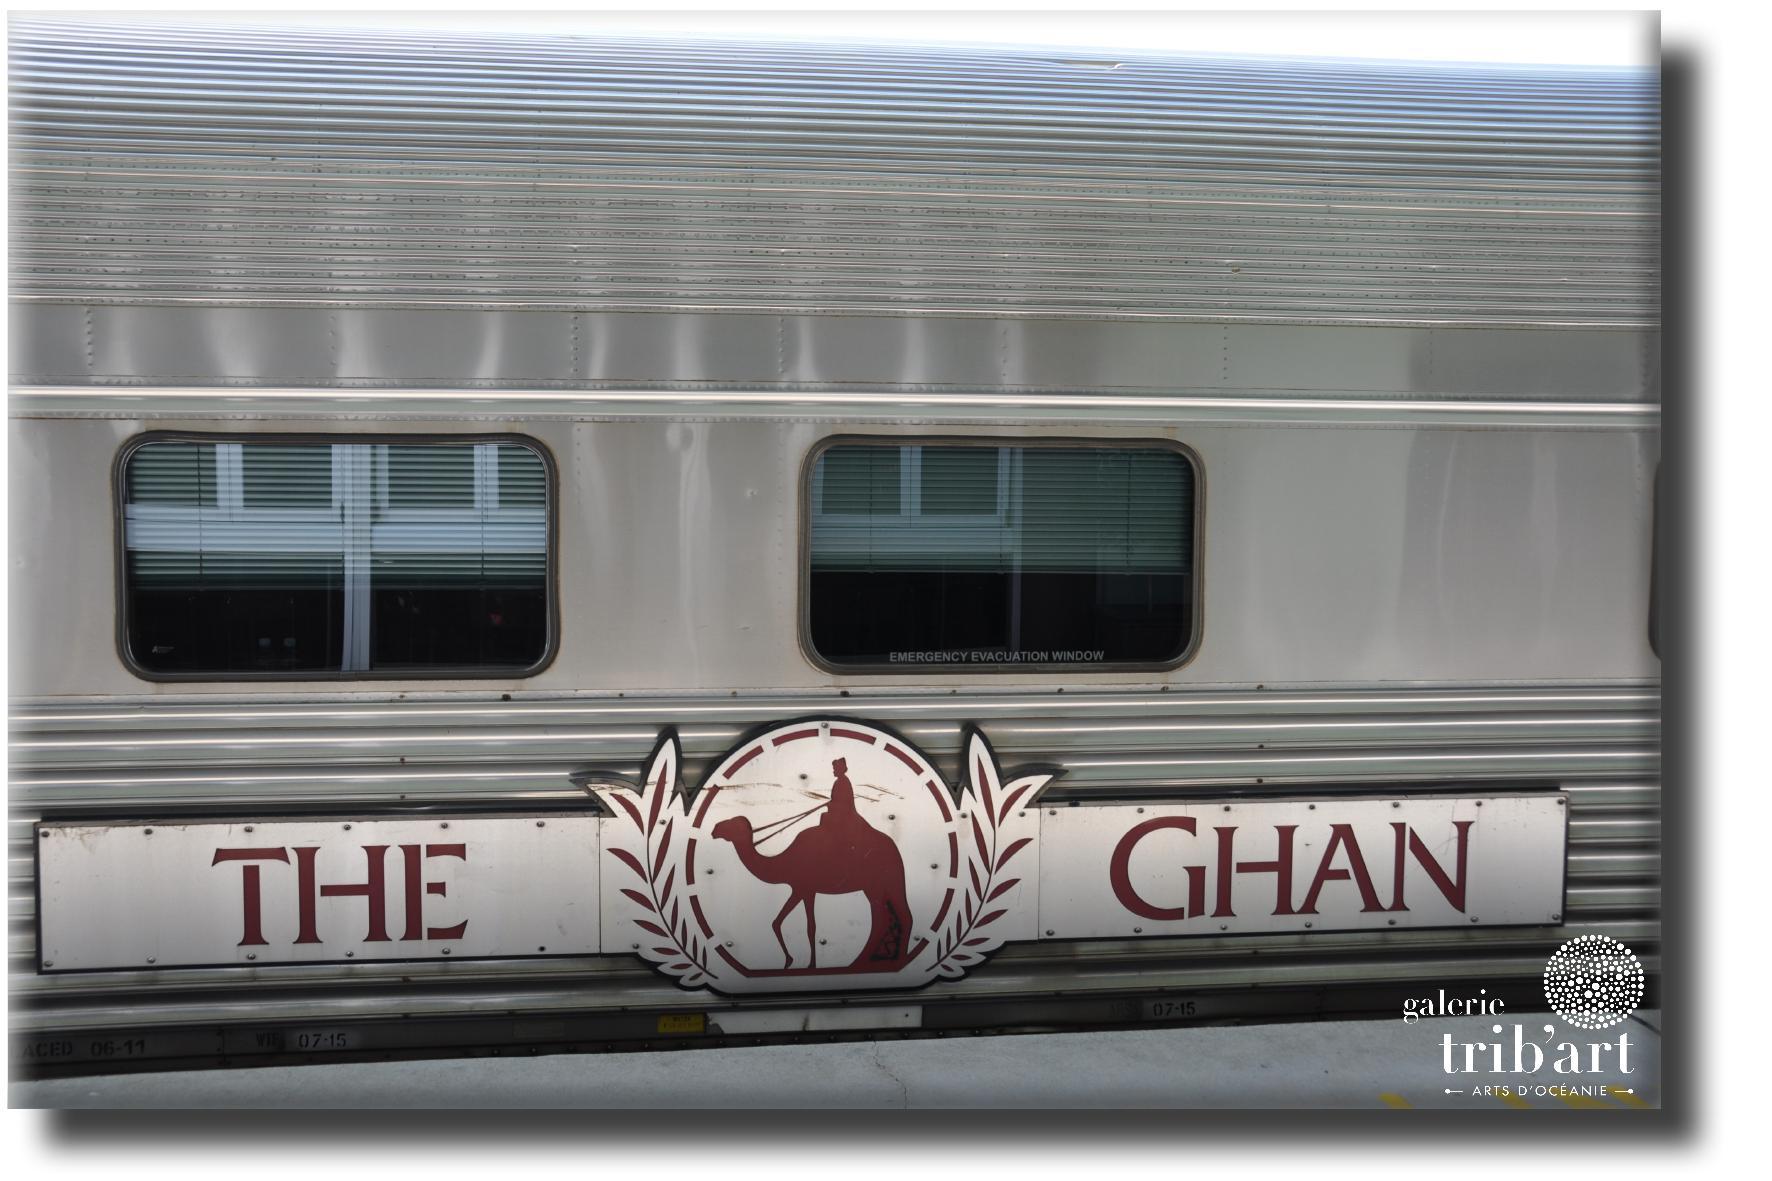 Le Ghan